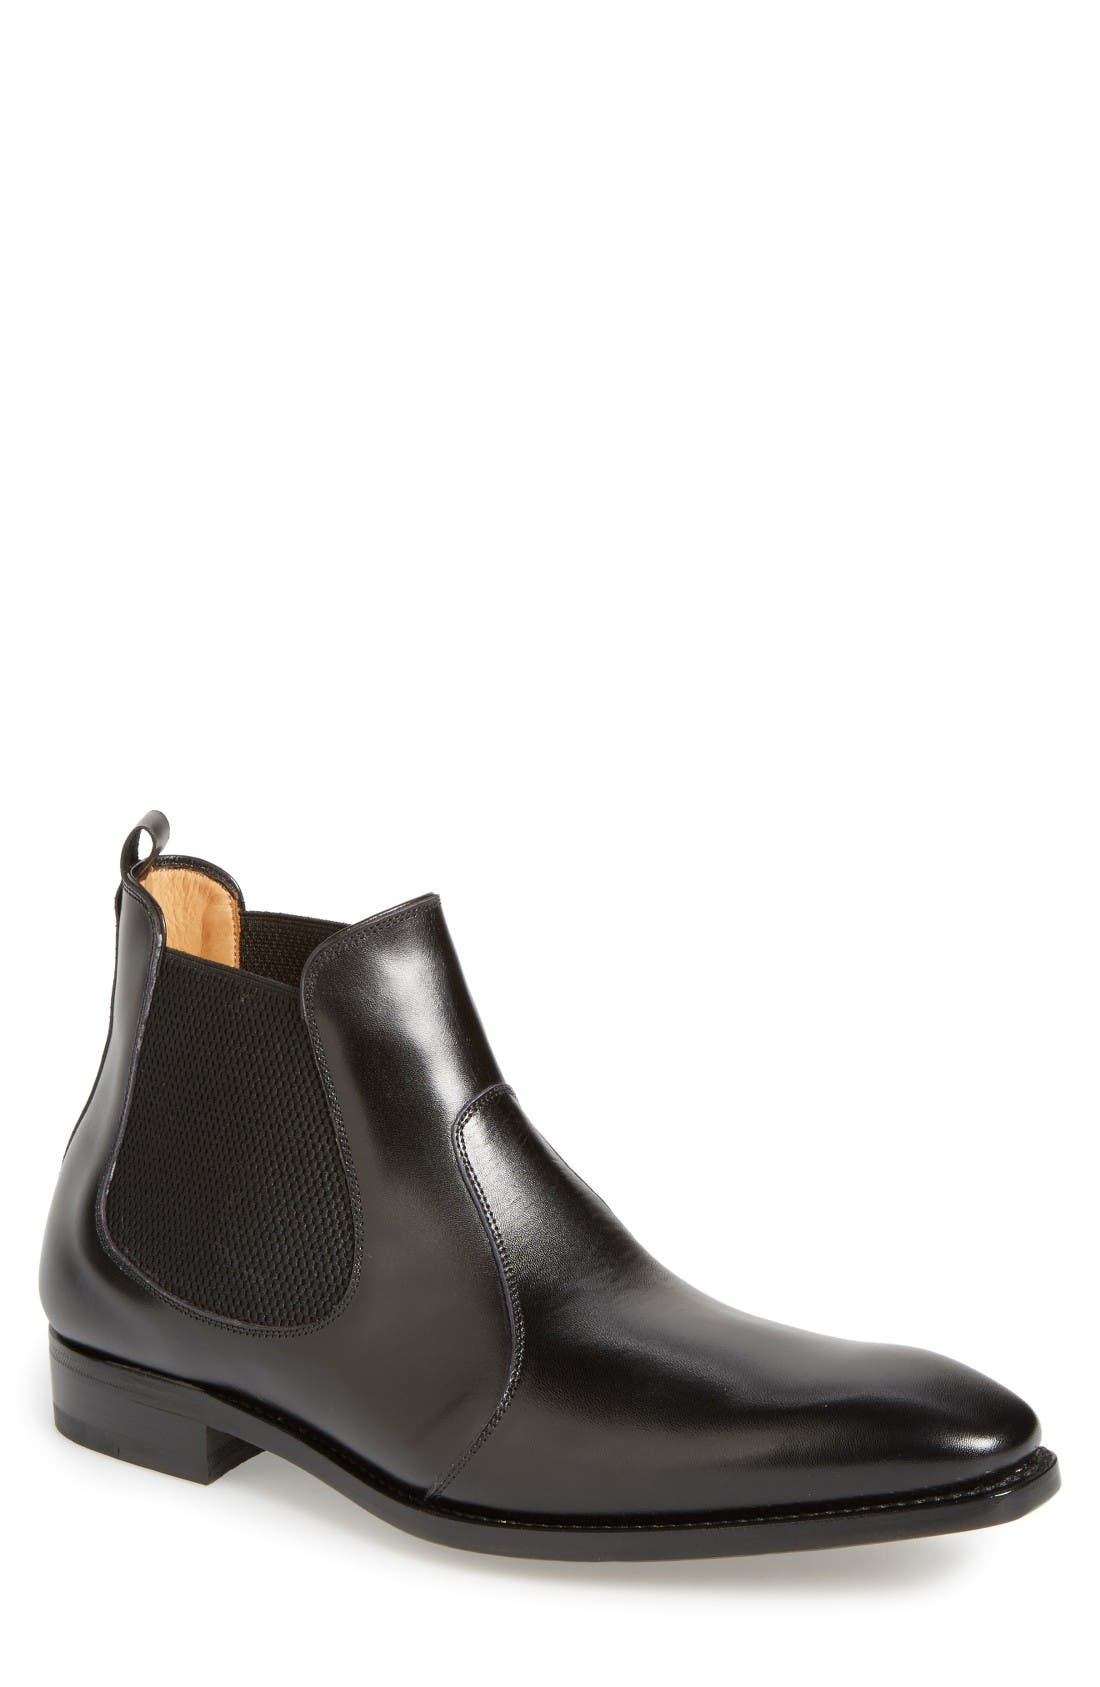 by Mezlan G112 Chelsea Boot,                             Main thumbnail 1, color,                             Black